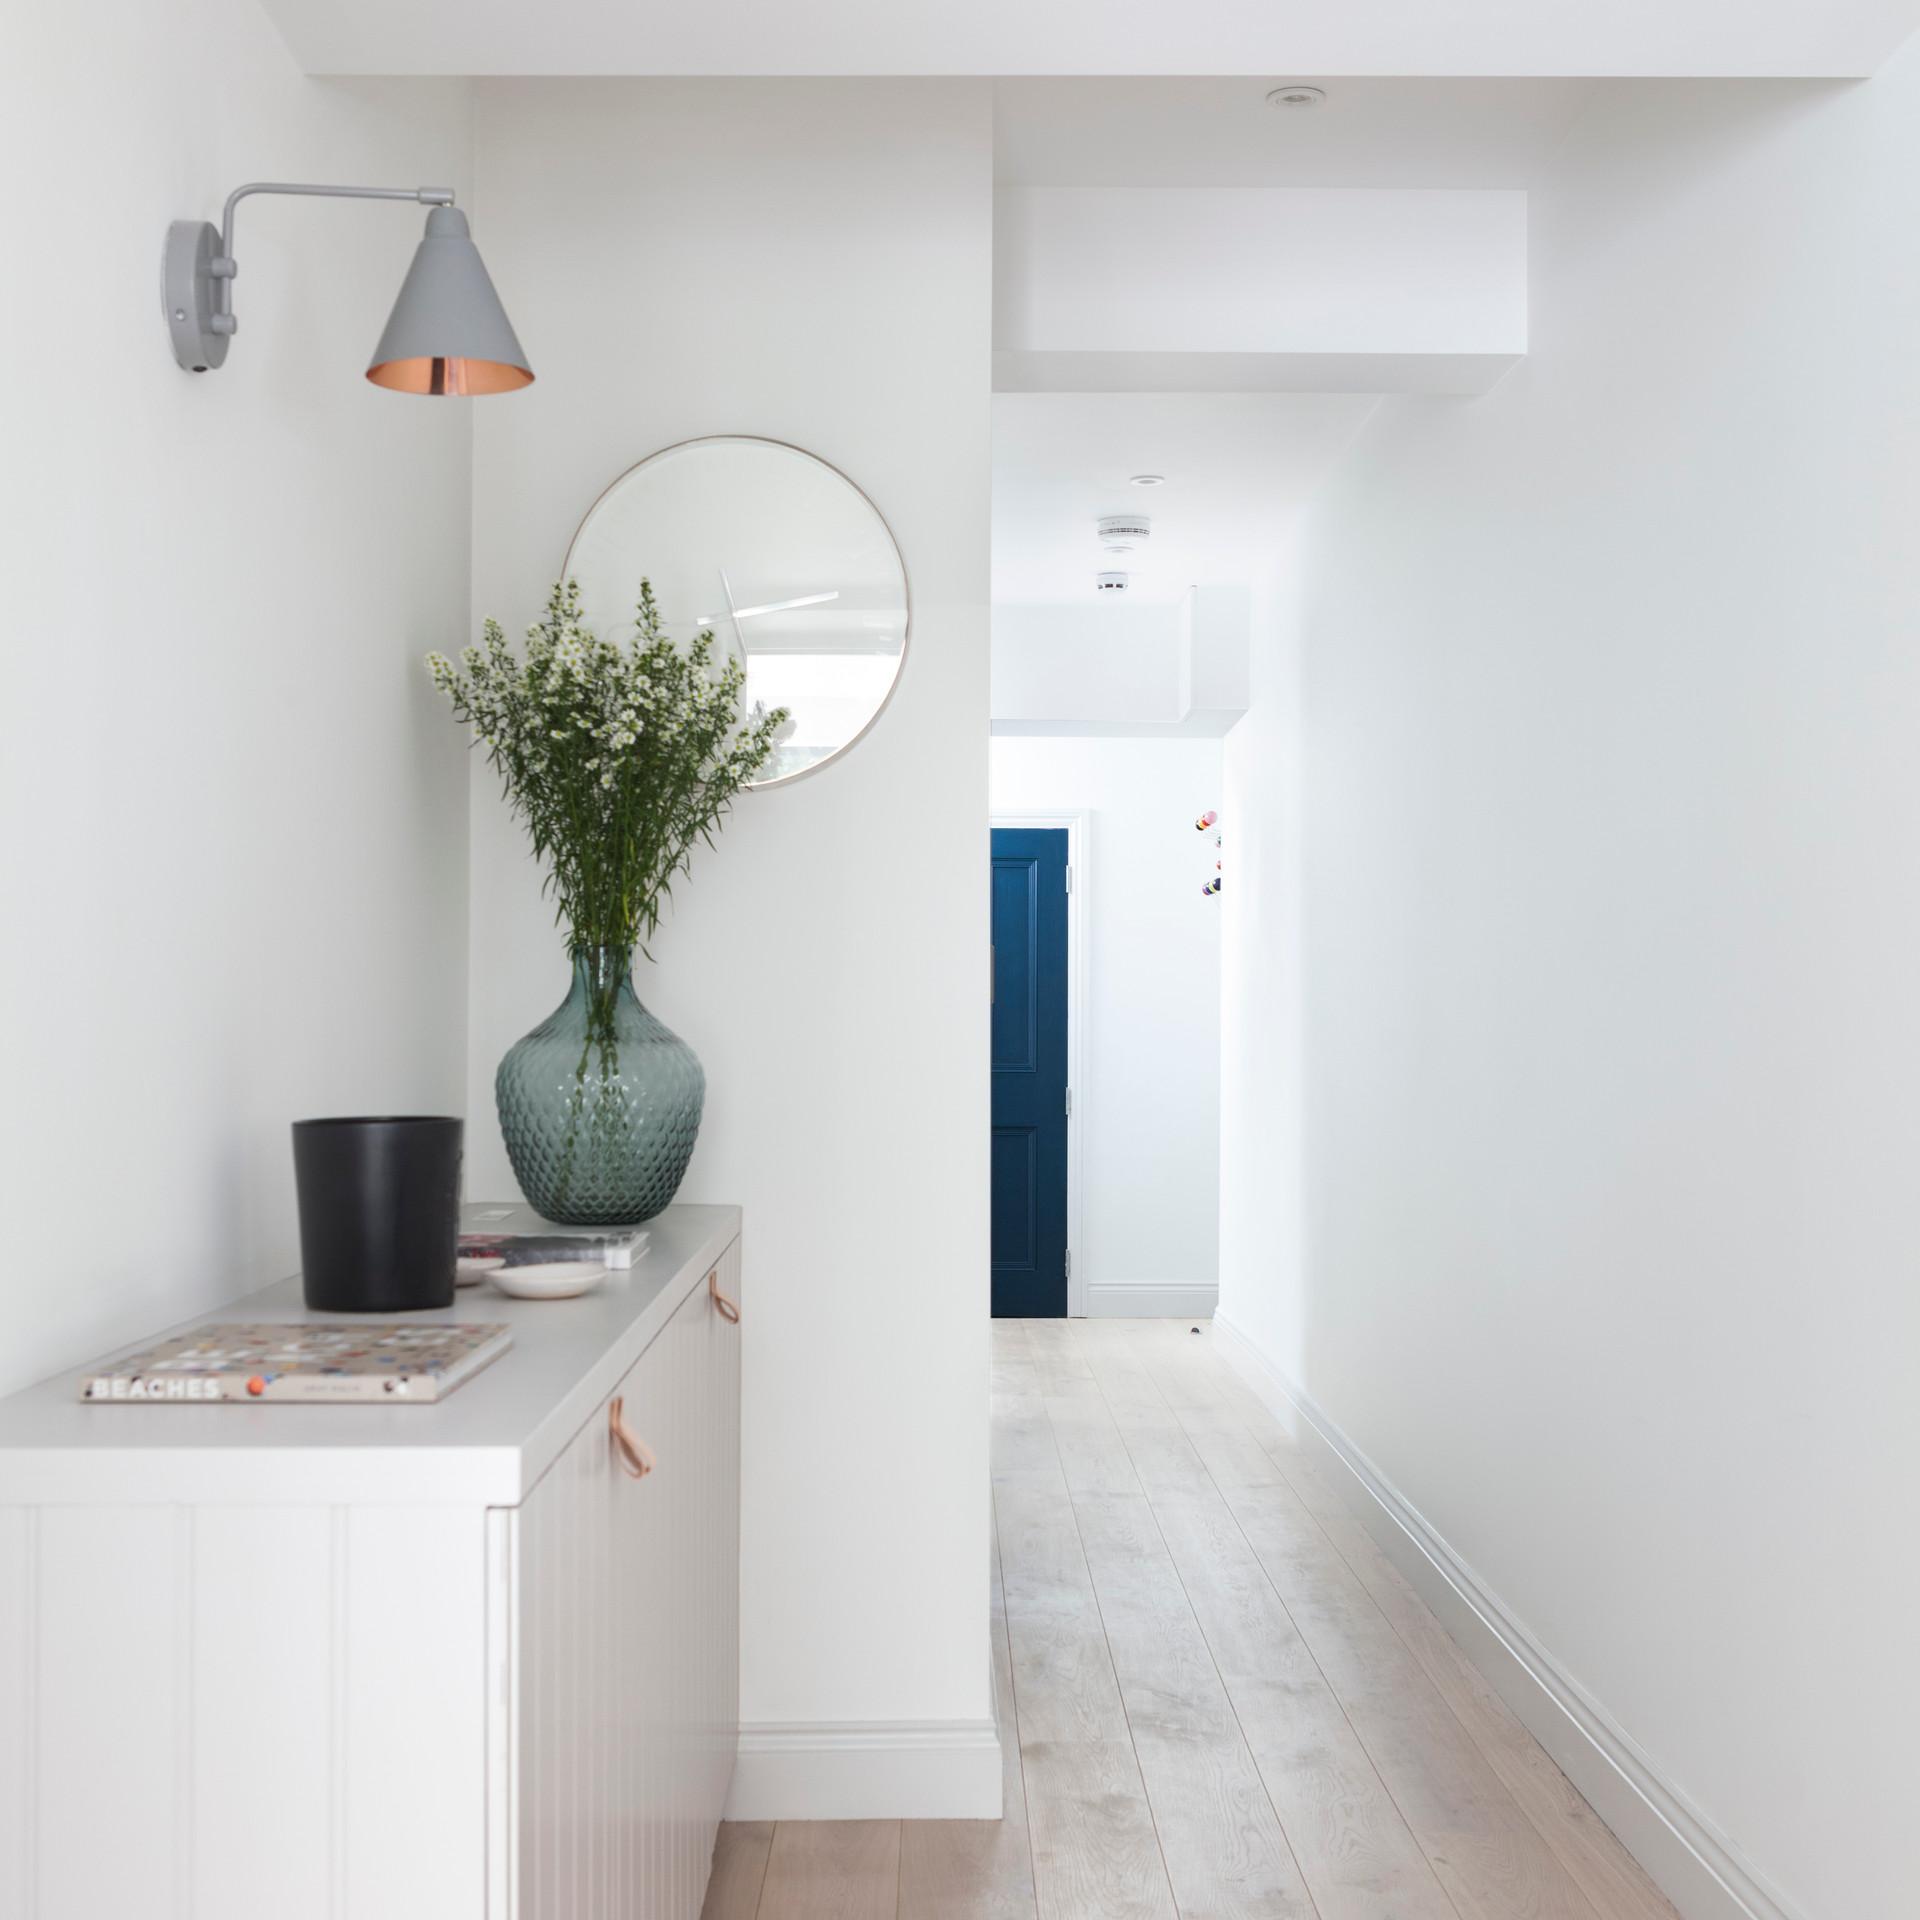 Hallway  - Design & Build by Freemand & Whitehouse